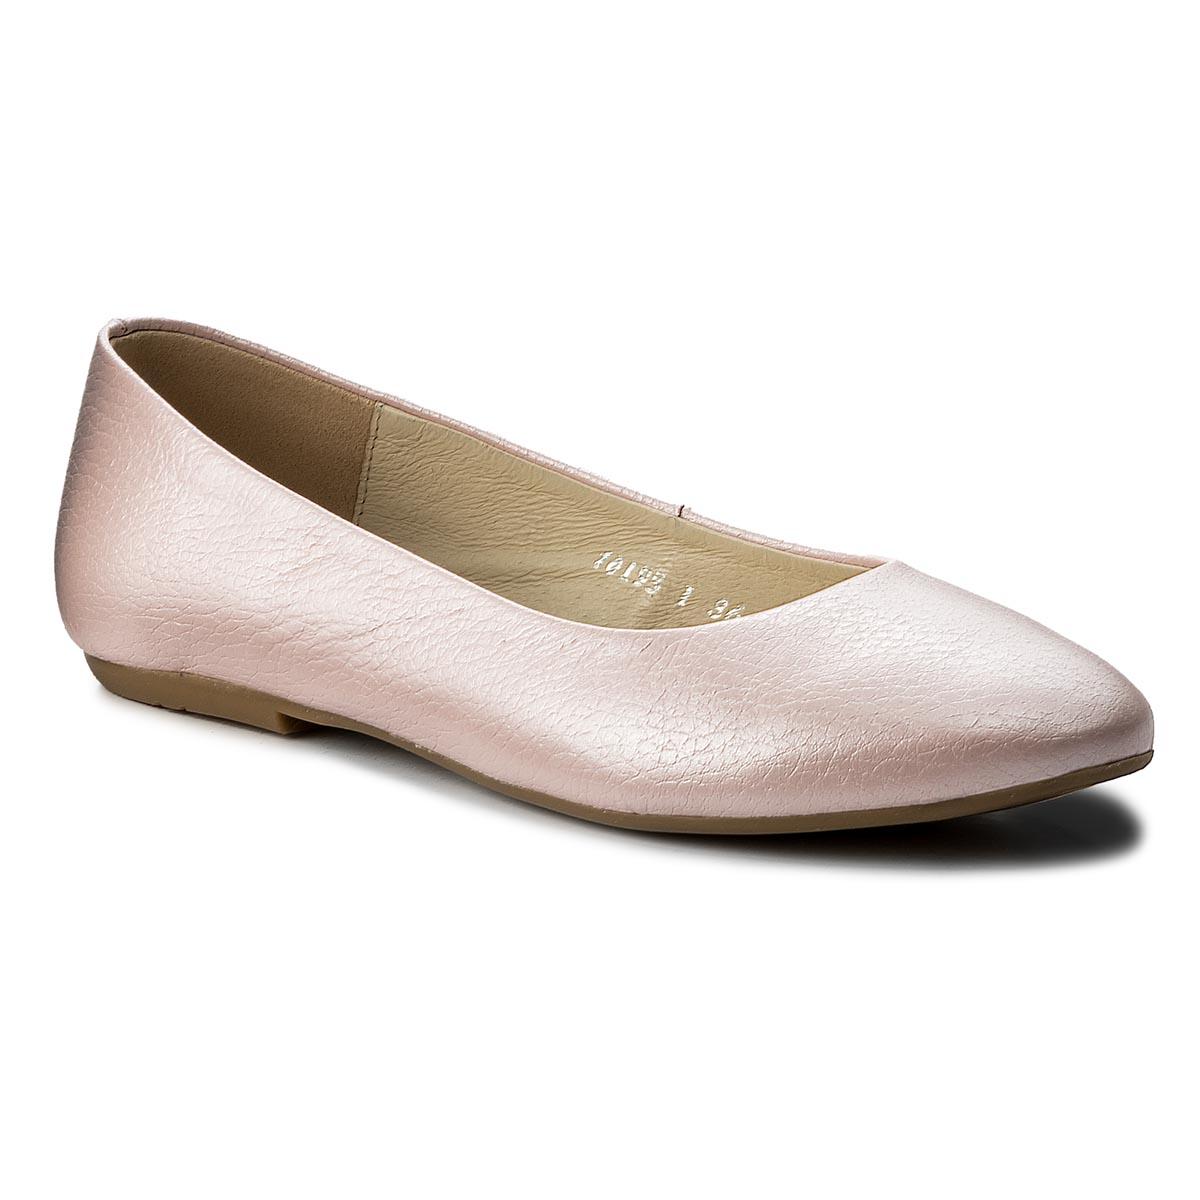 Image of Ballerinas BALDACCINI - 101950-Ł Floter 1